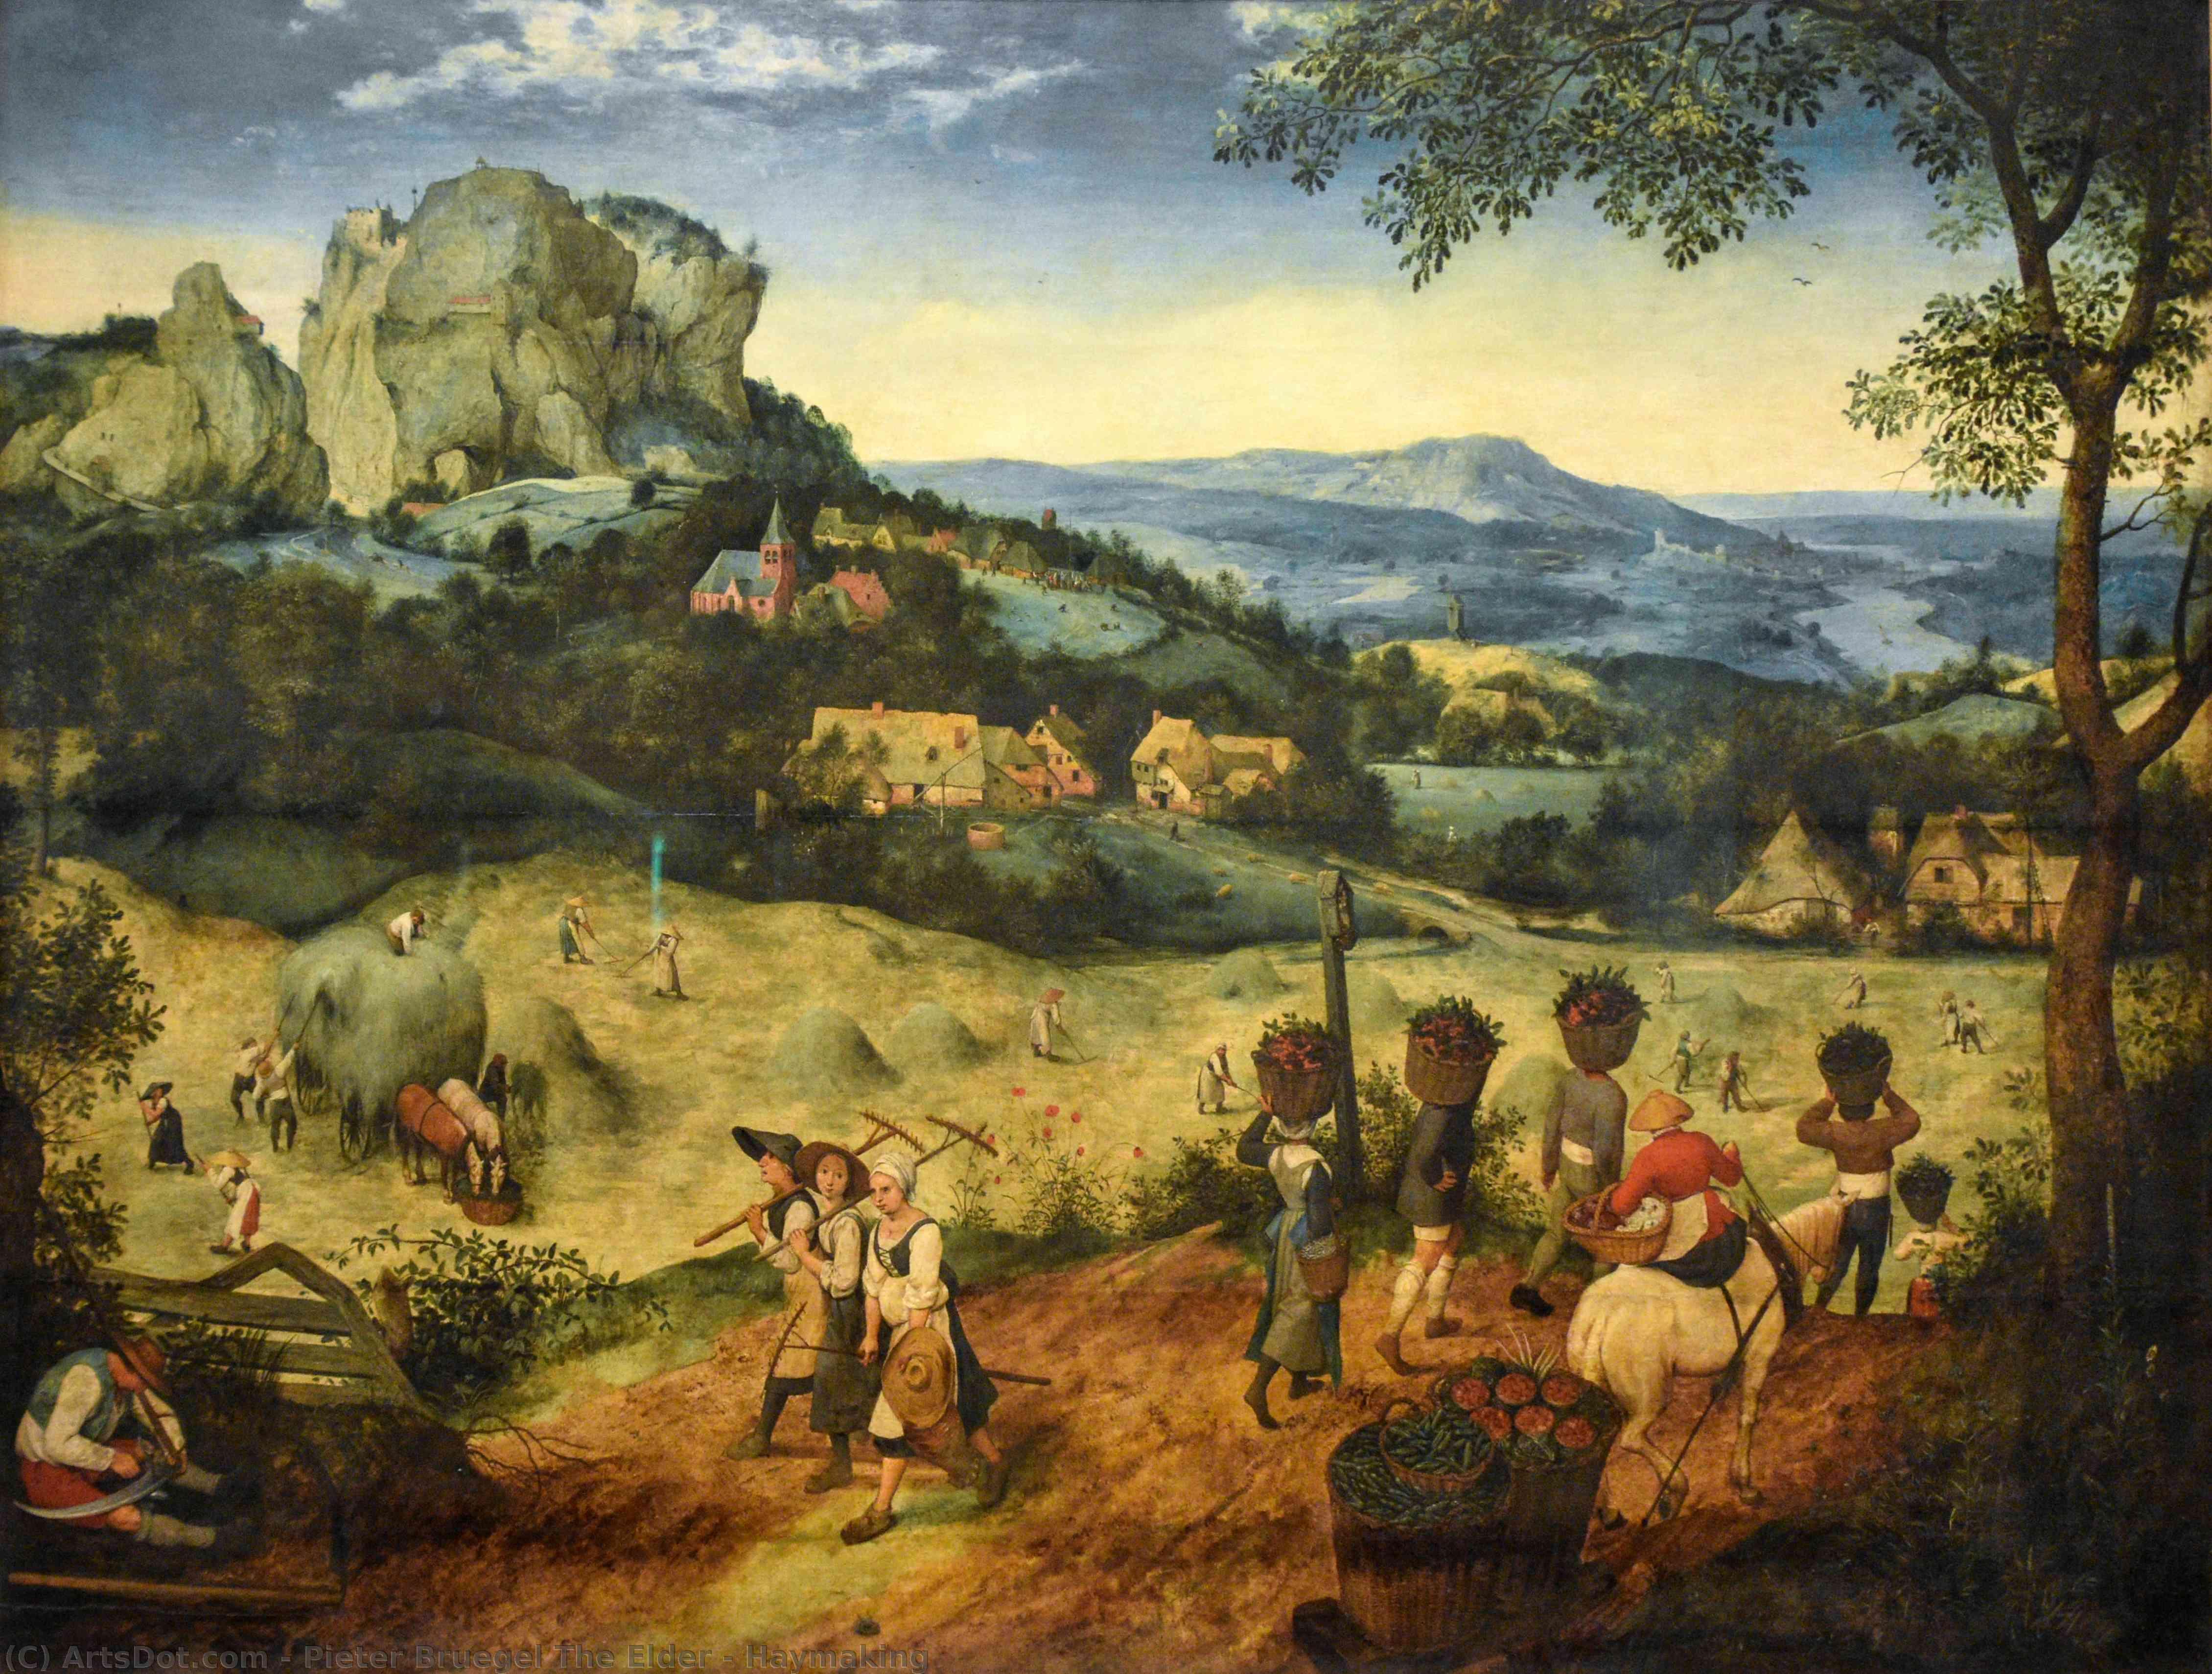 Wikioo.org - The Encyclopedia of Fine Arts - Painting, Artwork by Pieter Bruegel The Elder - Haymaking